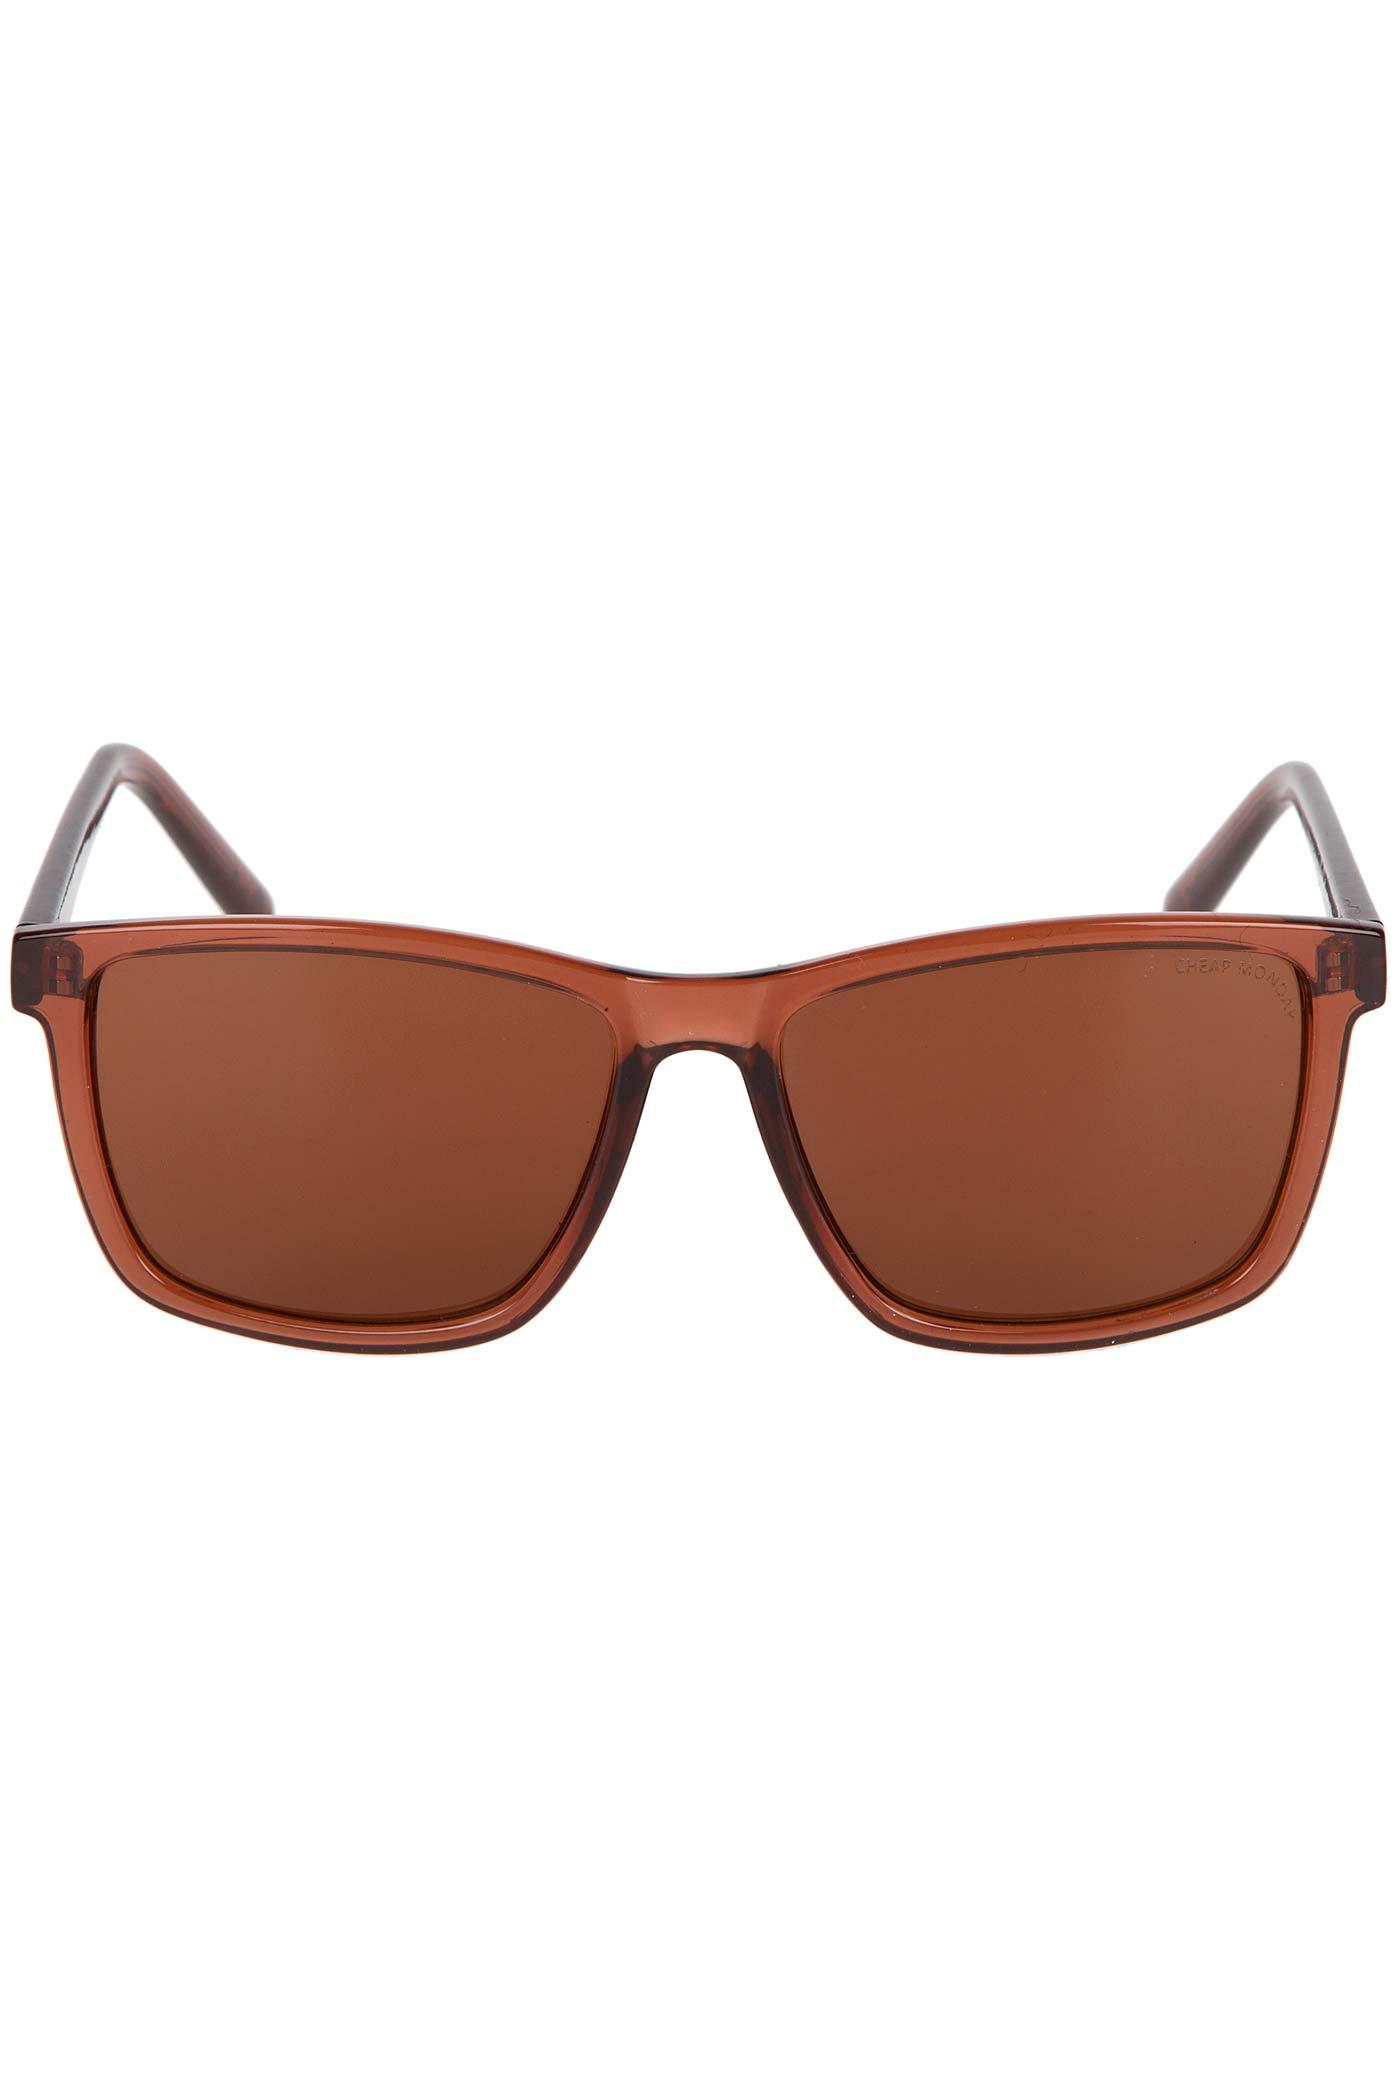 cheap monday straight sonnenbrille brown kaufen bei skatedeluxe. Black Bedroom Furniture Sets. Home Design Ideas